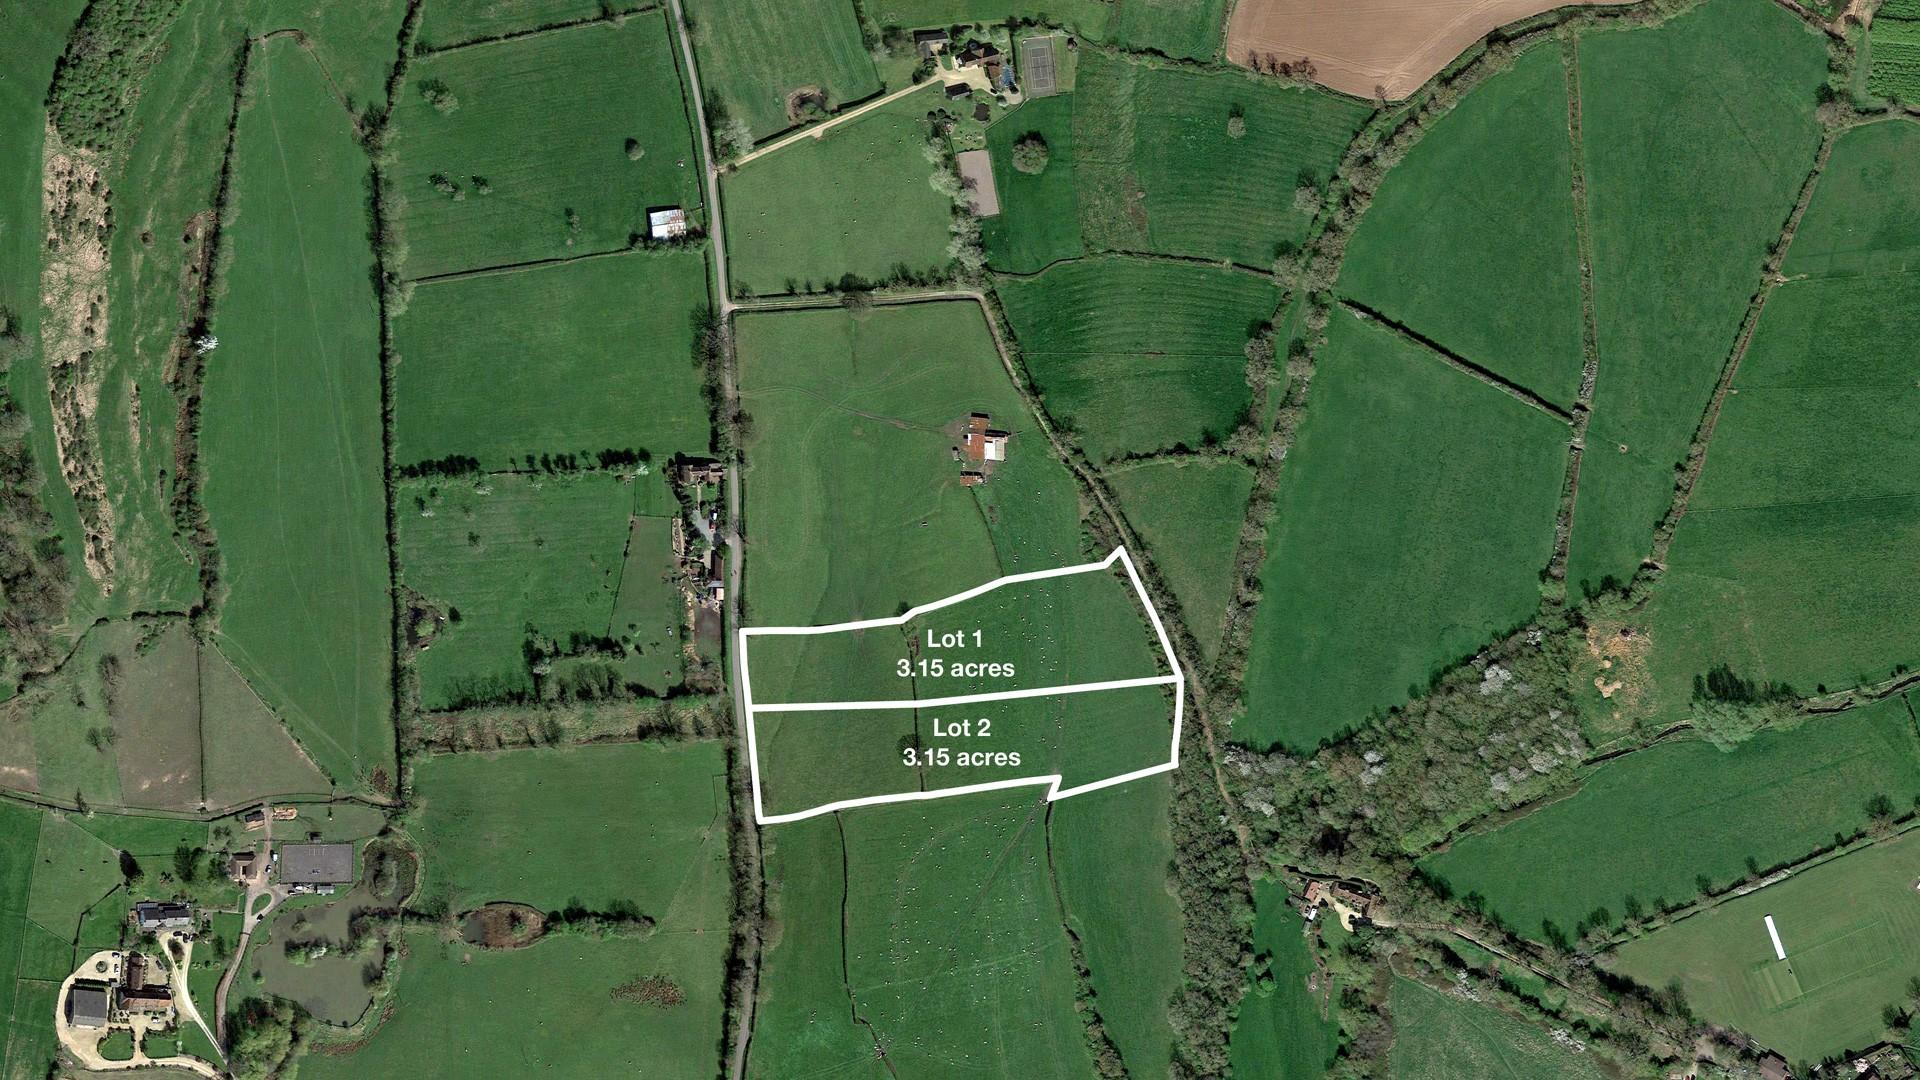 land-for-sale-berrowhill-view-feckenham